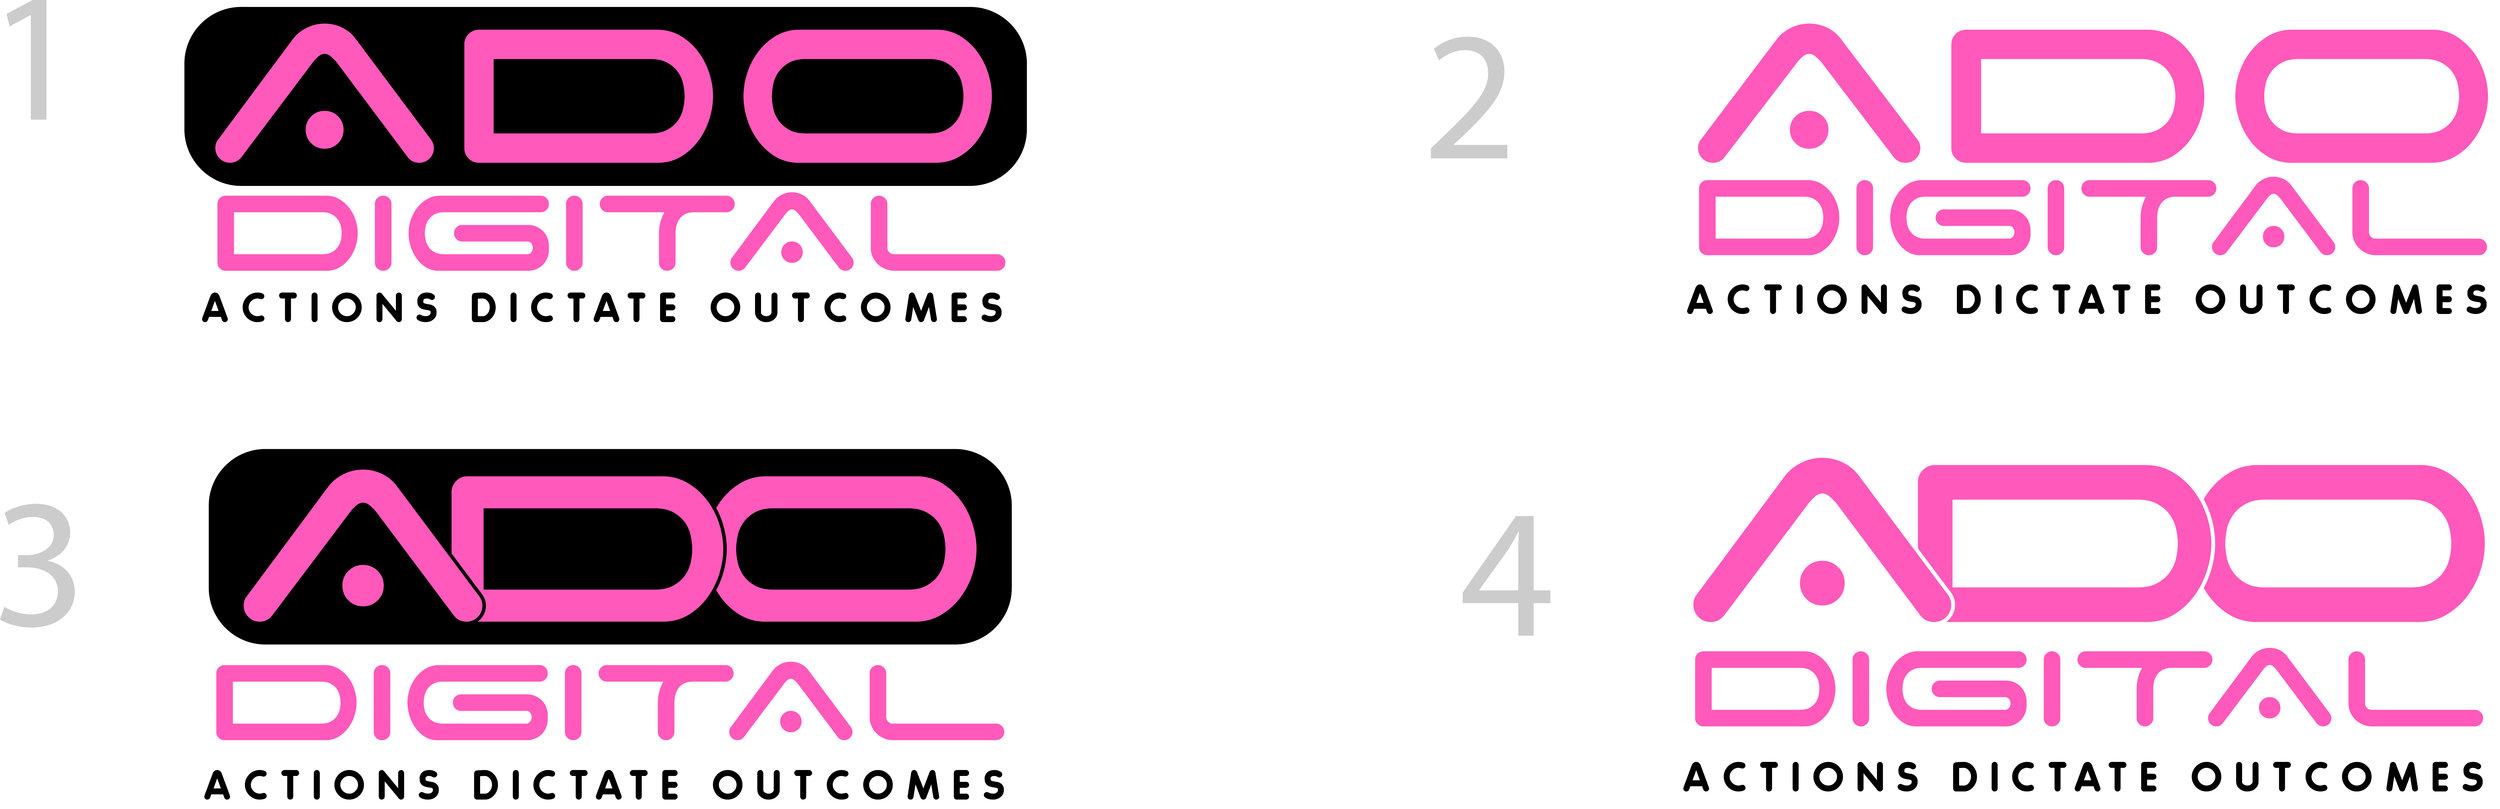 ADO digital Logo 2015 copy 2.jpg